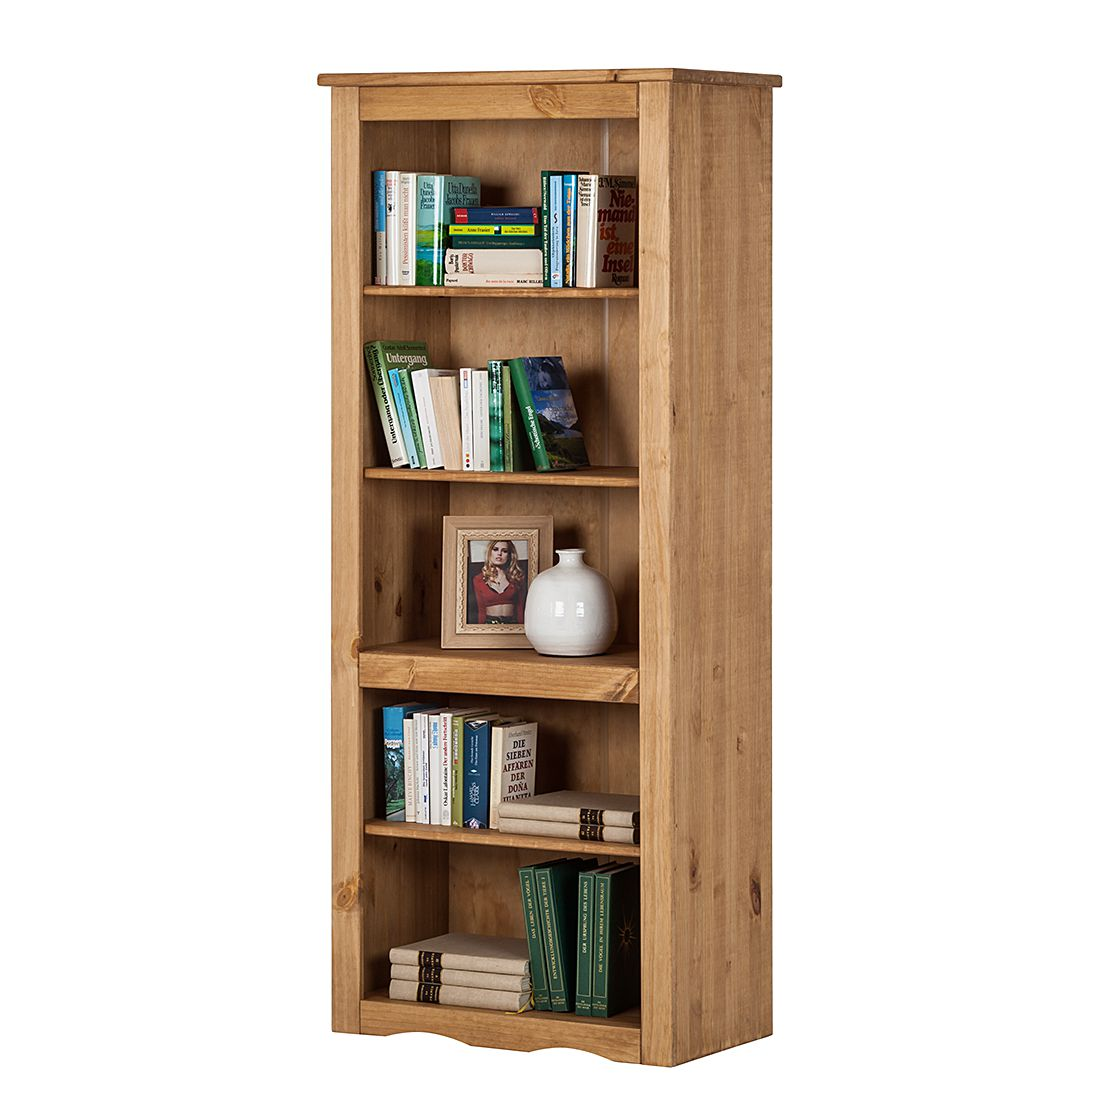 Bücherregal holz natur preisvergleiche